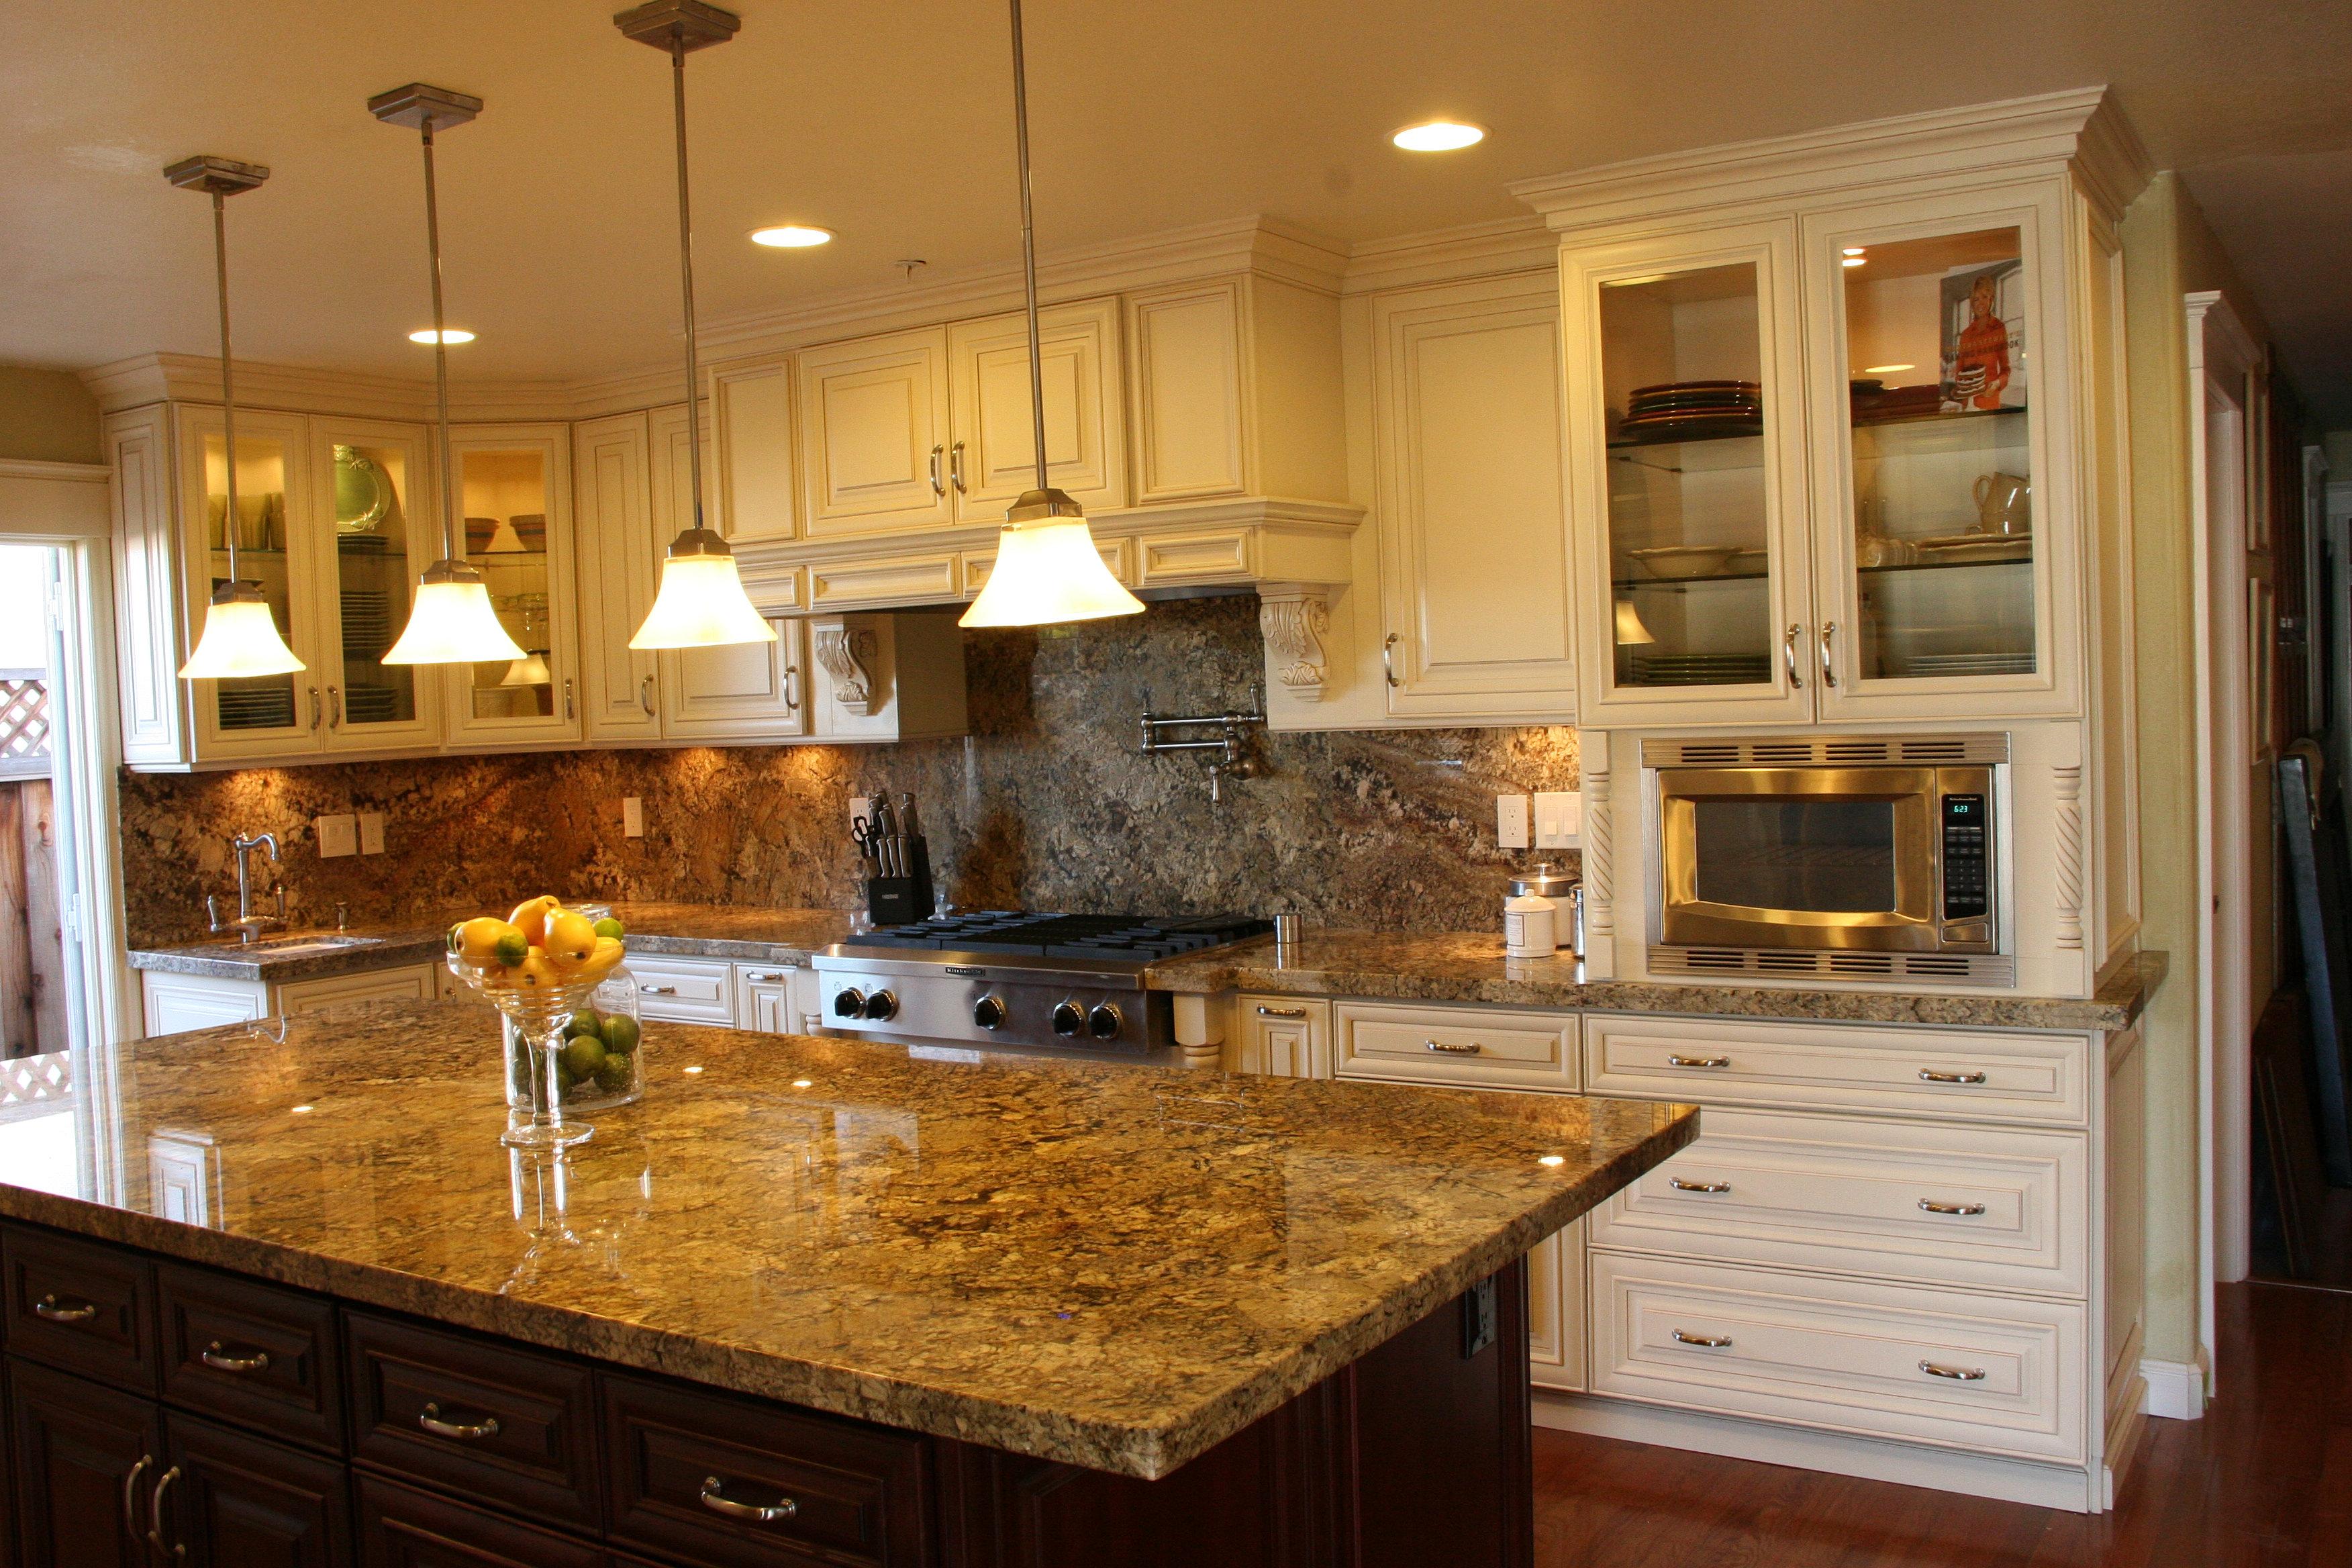 real wood kitchen cabinets kitchen design studio rh kitchendesignstudio blogspot com